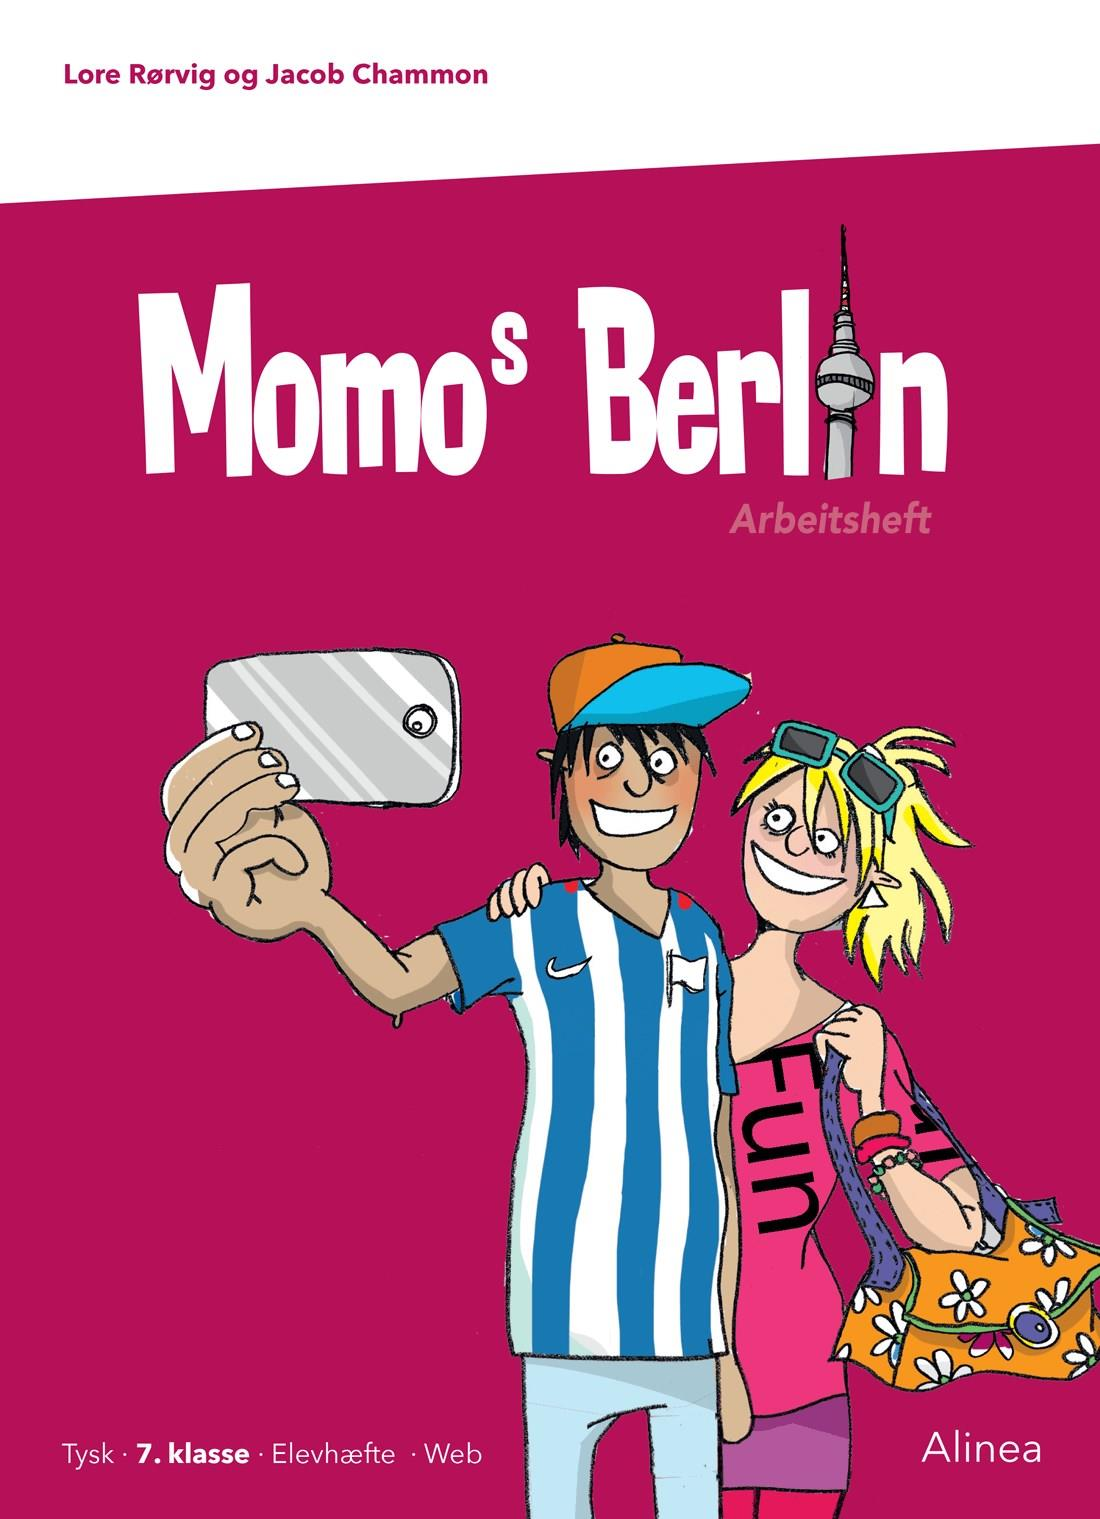 Momo: Momos Berlin, 7. kl., Arbeitsheft - Jacob Chammon; Lore Rørvig - Bøger - Alinea - 9788723540331 - 1/8-2019